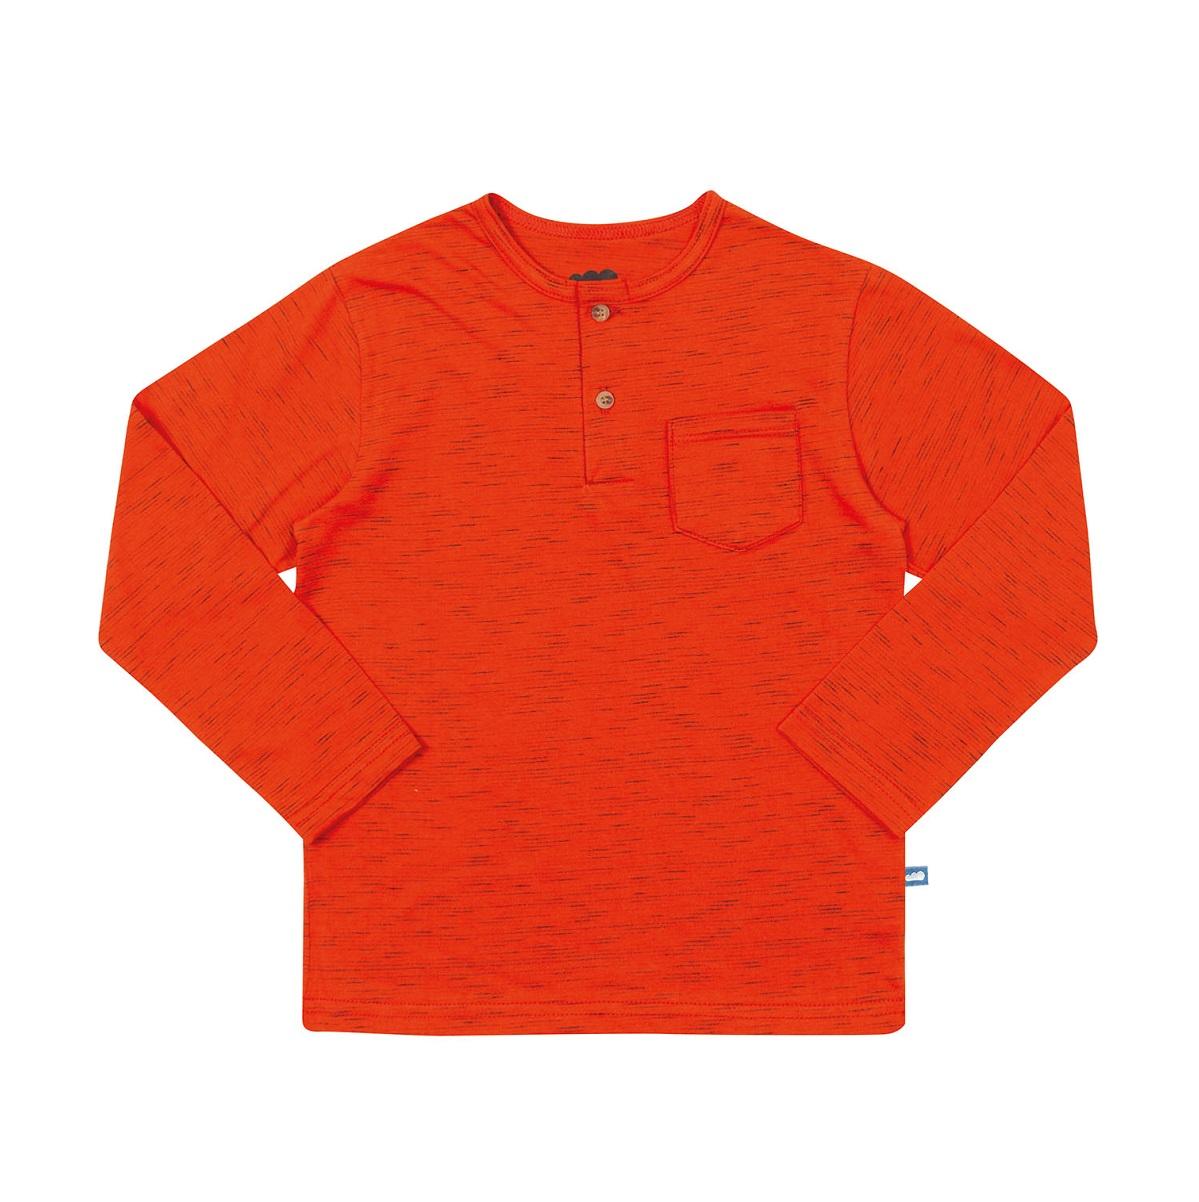 Camiseta Infantil Masculina - MARLAN 54212